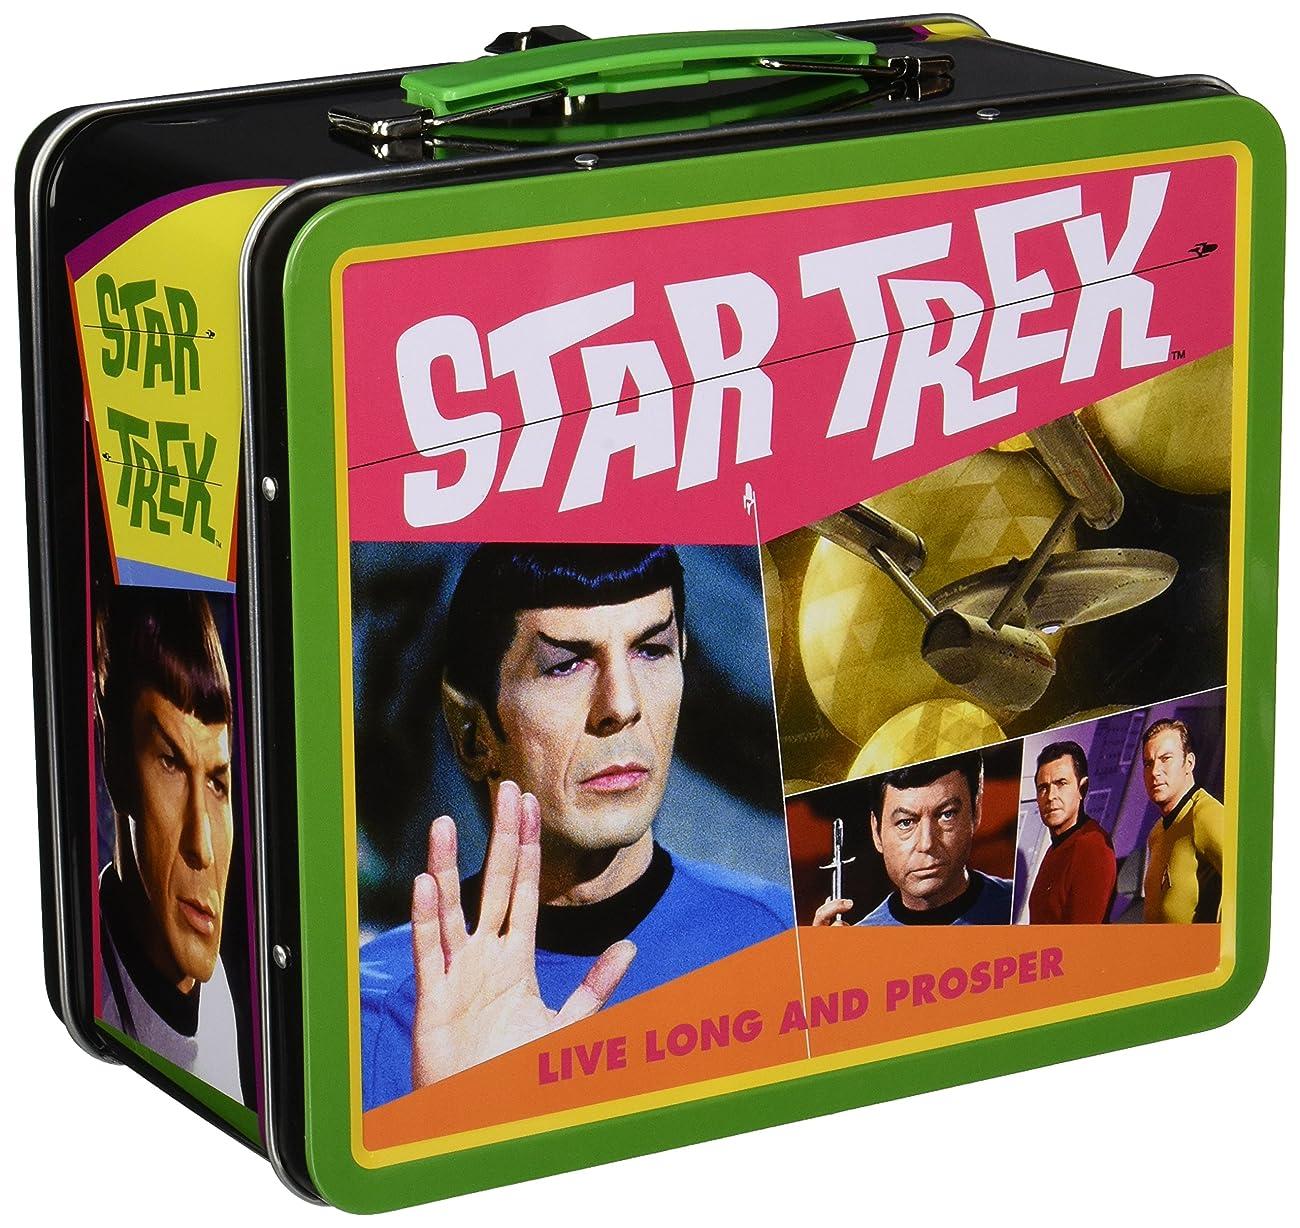 Aquarius Star Trek Retro Large Tin Fun Box 2